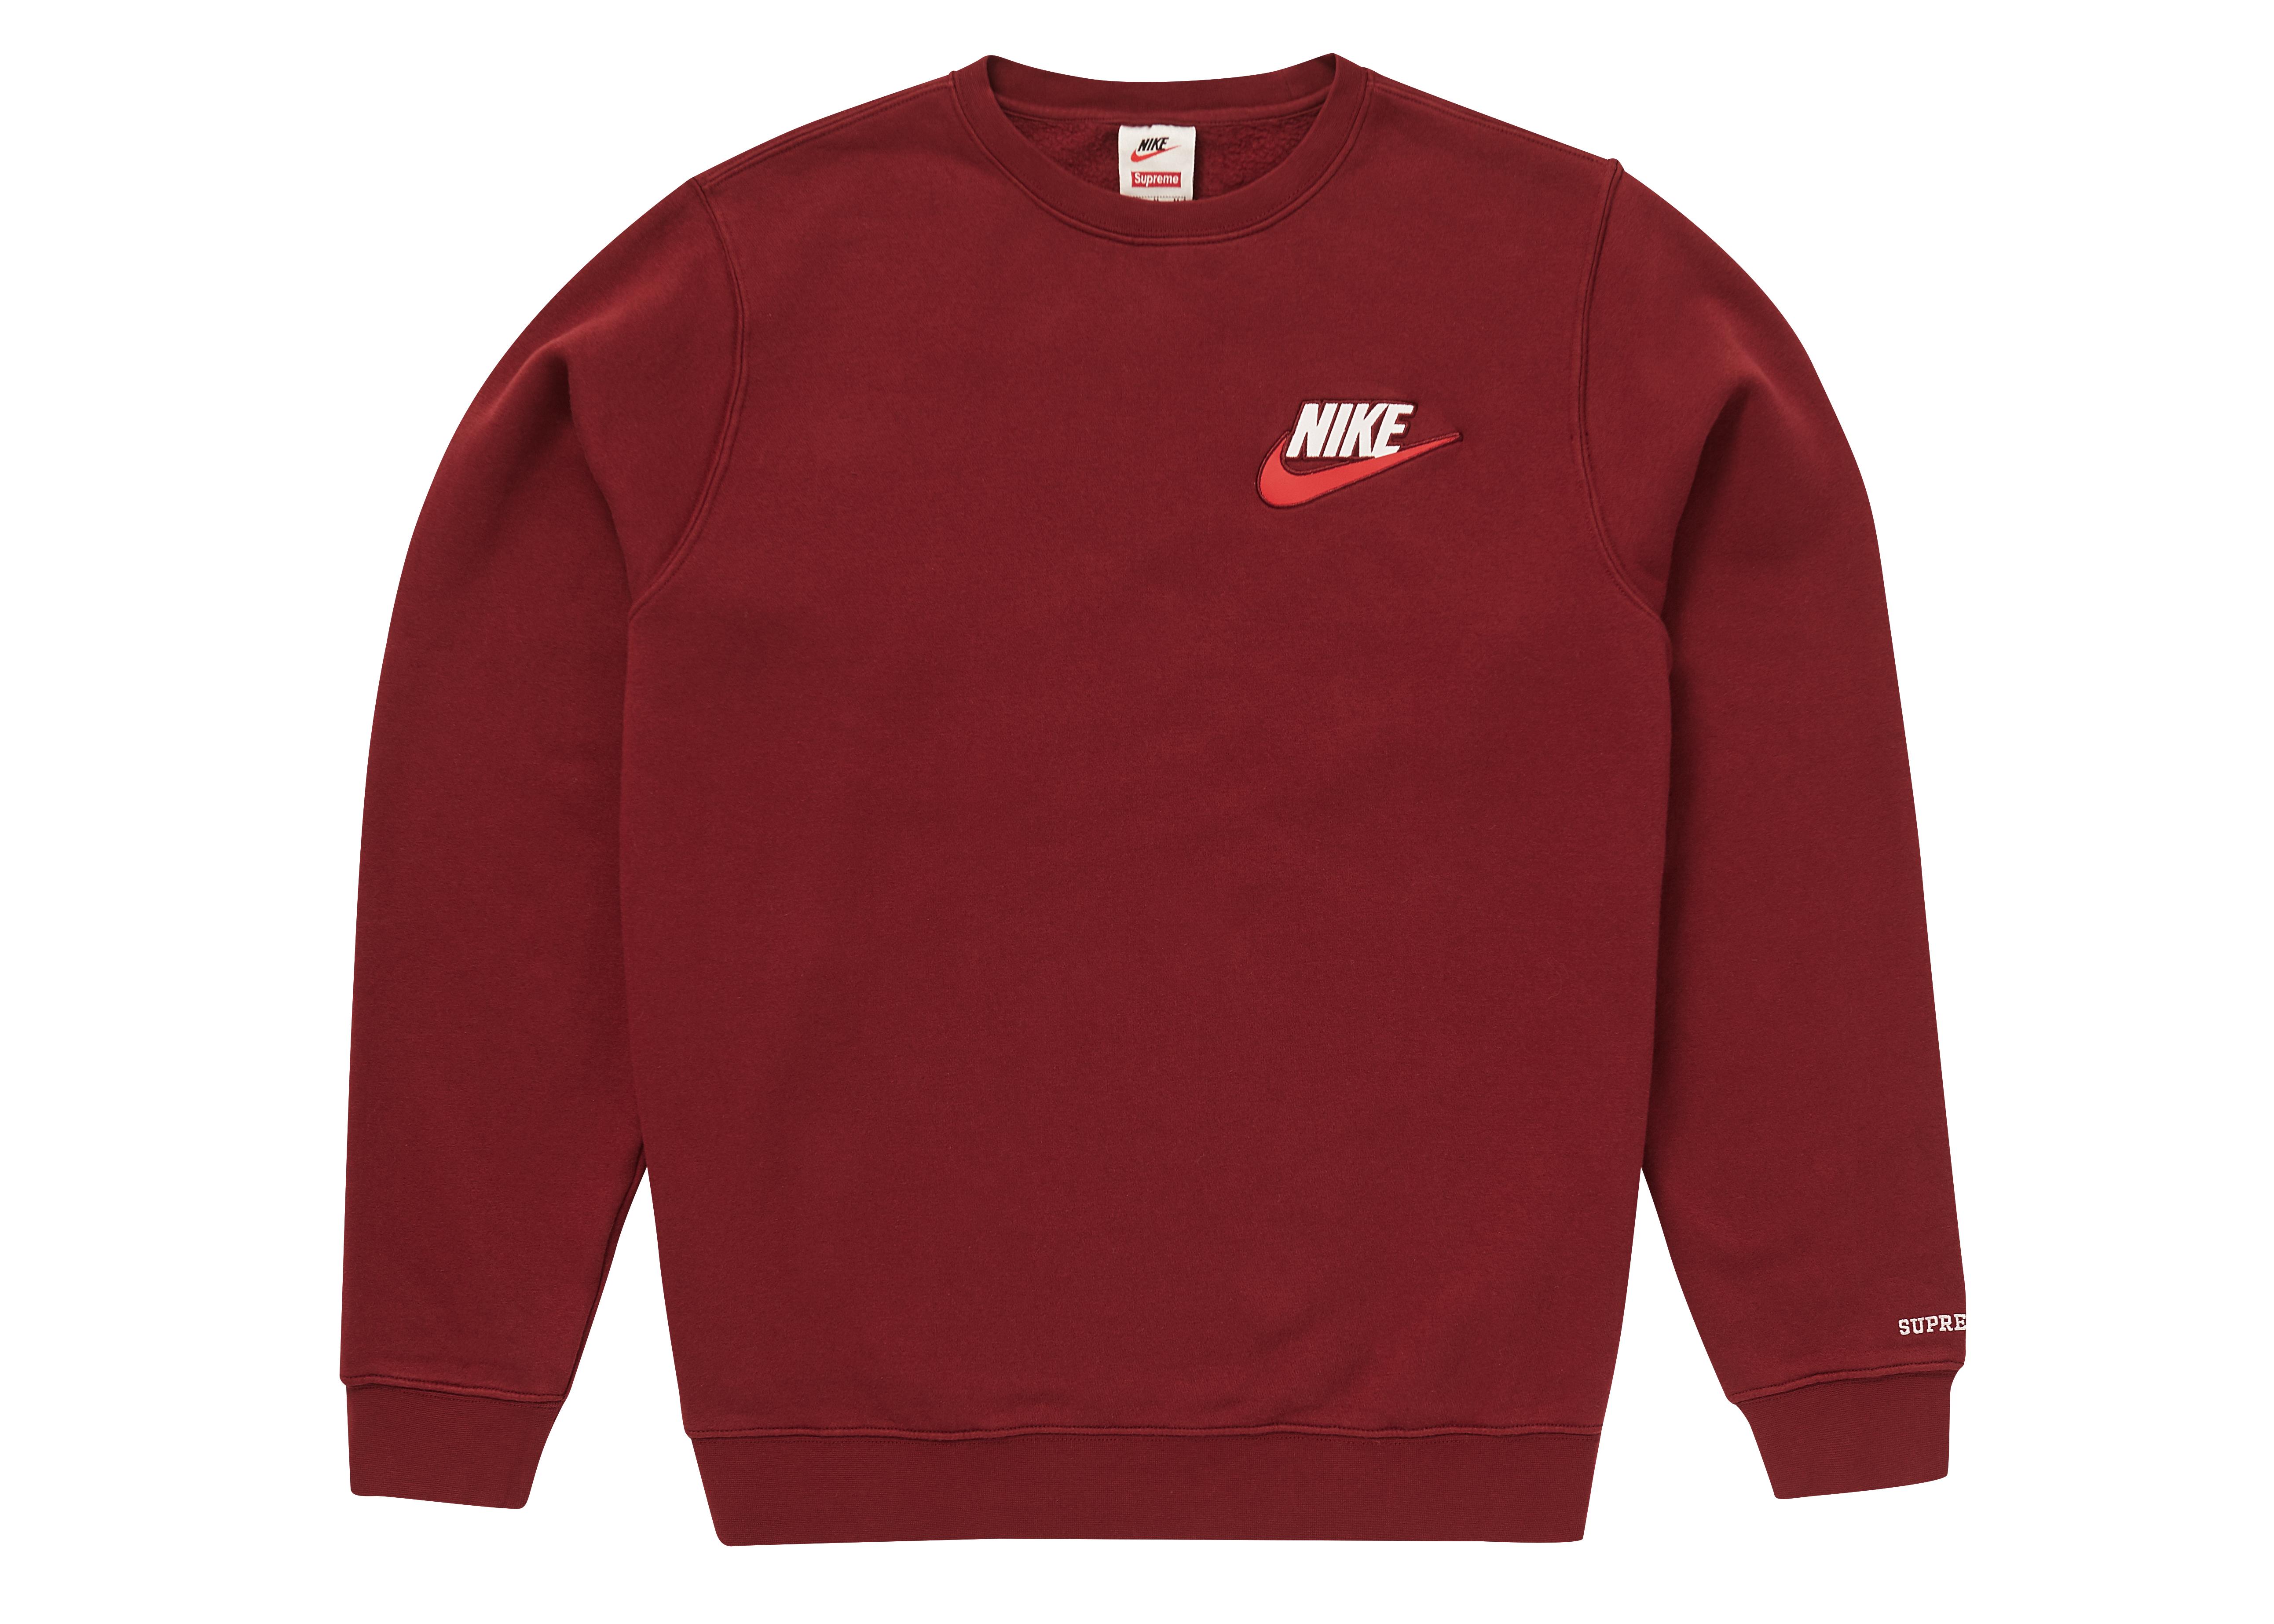 Supreme Nike Crewneck Burgundy